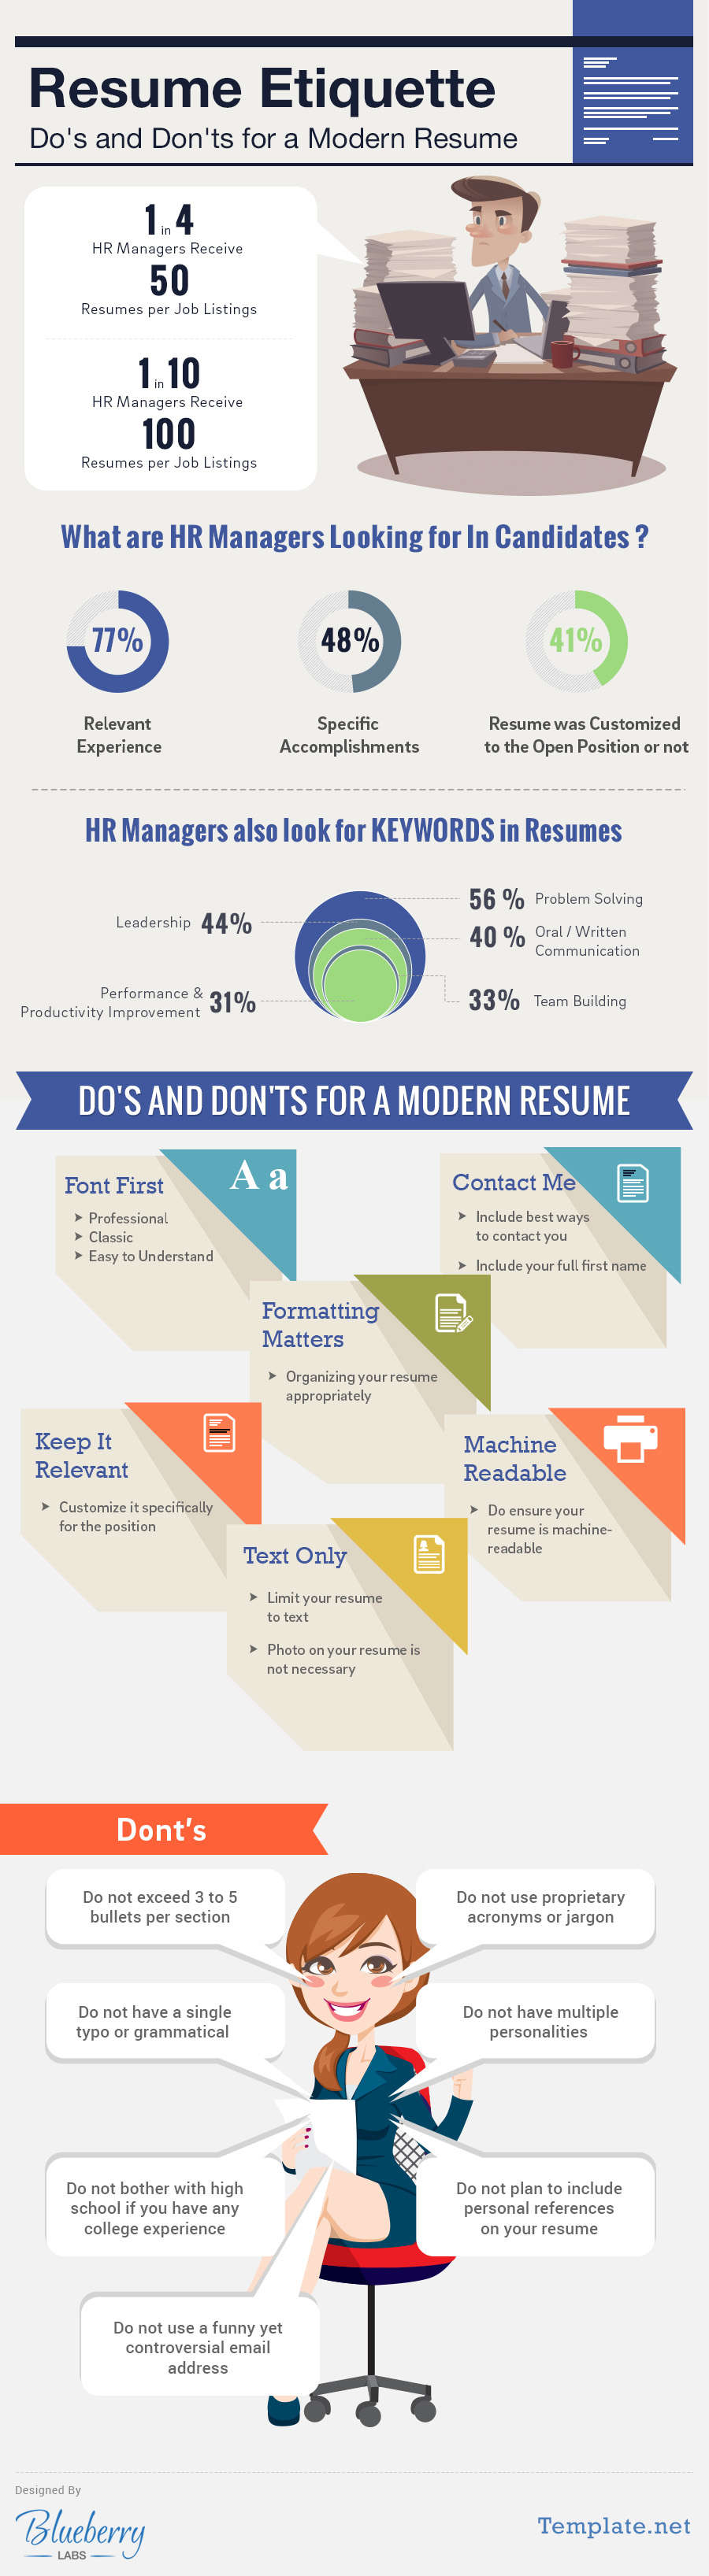 Best resume writing services australia